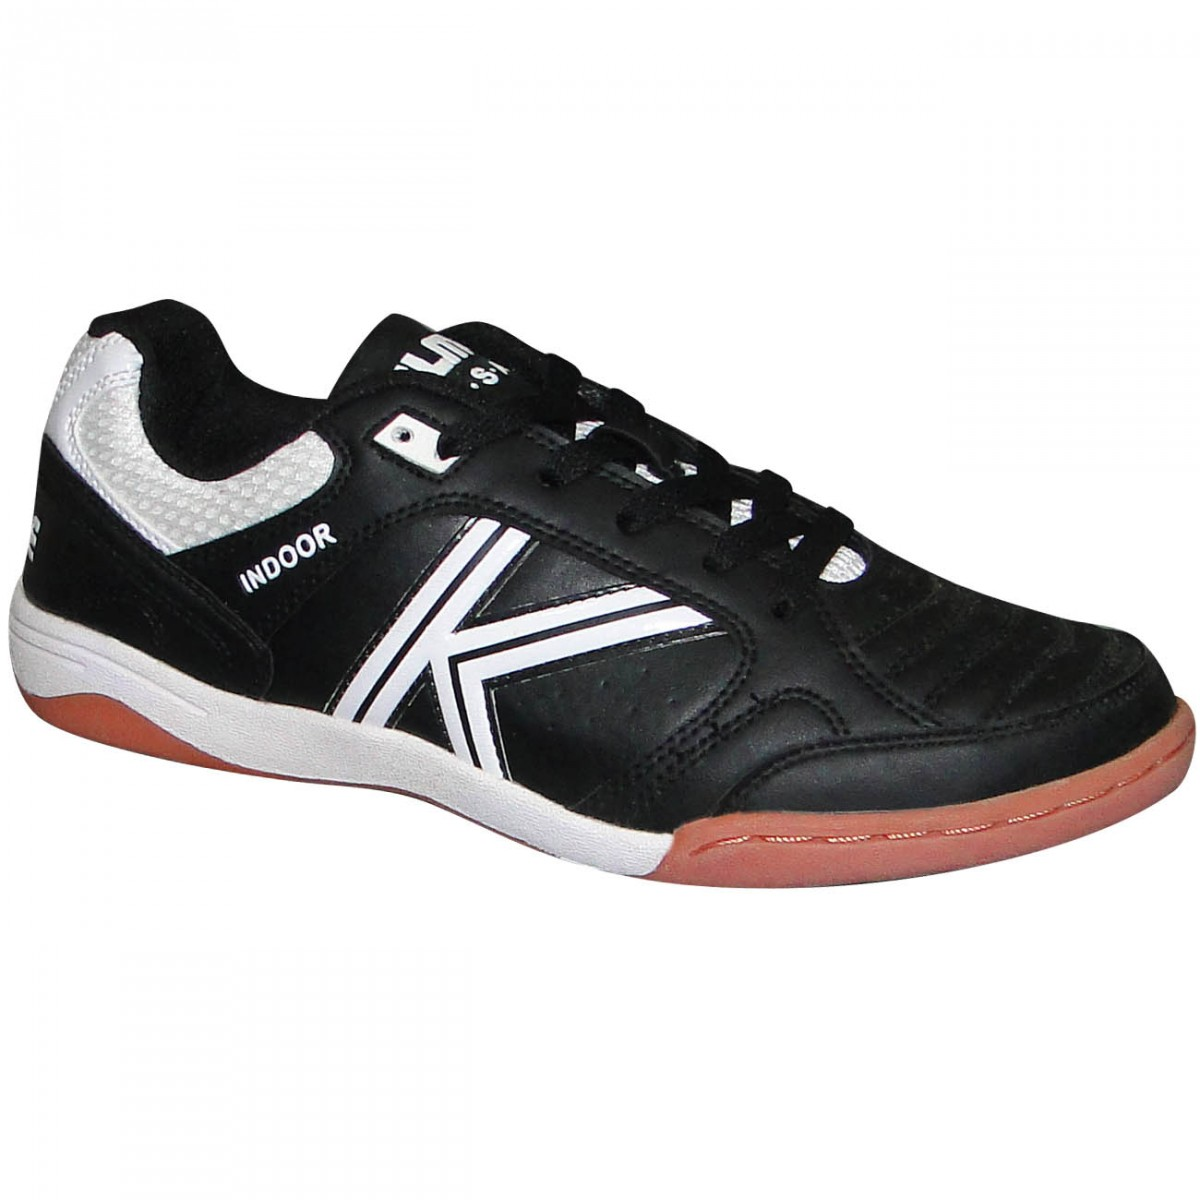 8dab5f5624282 Tenis Kelme Alicante 55327 26 - Preto/Branco - Chuteira Nike, Adidas ...